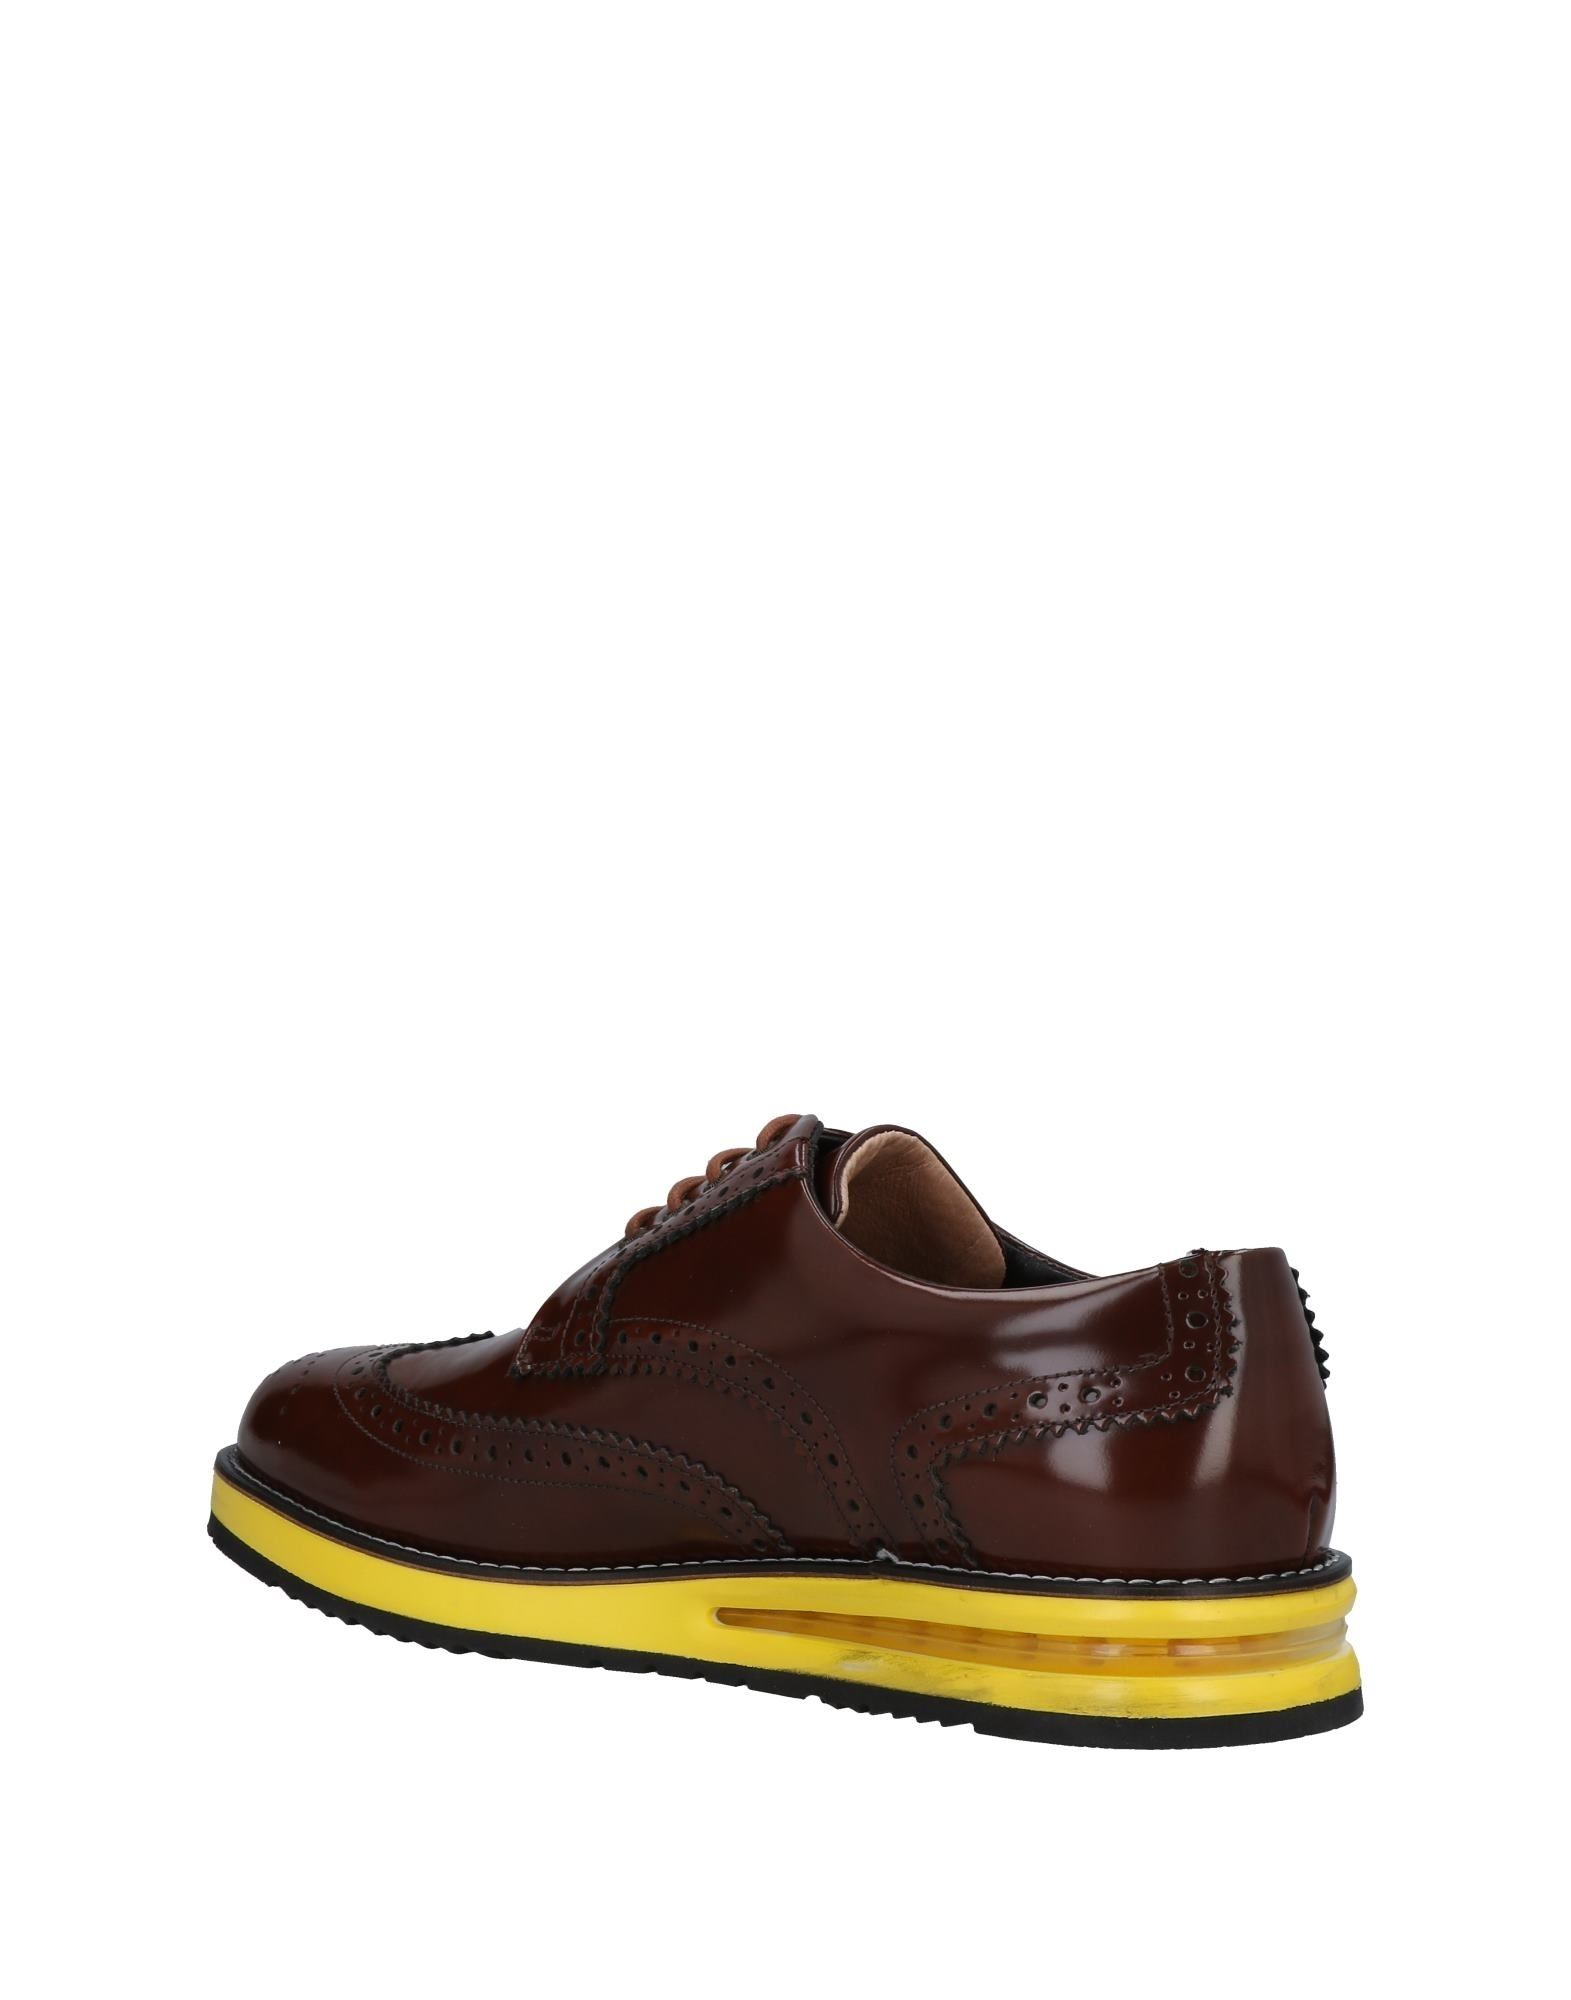 Rabatt Rabatt Rabatt echte Schuhe Barleycorn Schnürschuhe Herren  11478920LQ be62c3